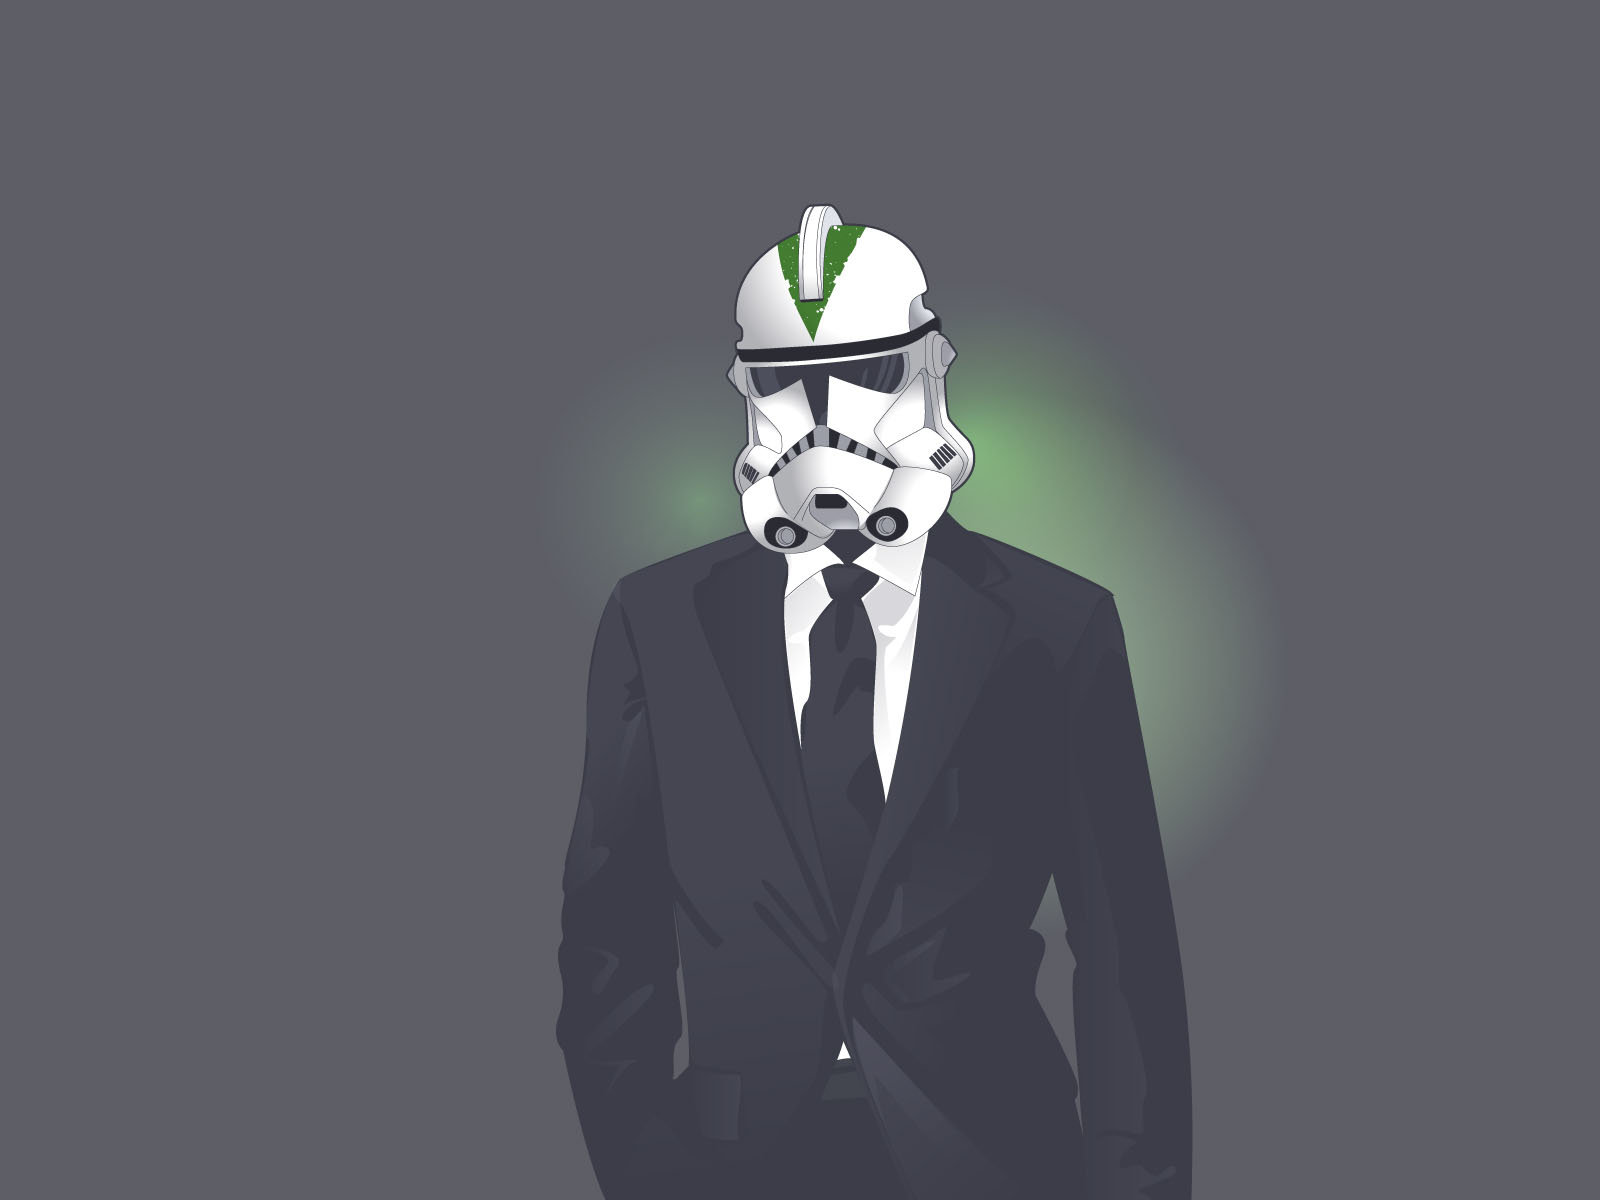 Funny Star Wars Wallpapers Hd For Desktop Backgrounds